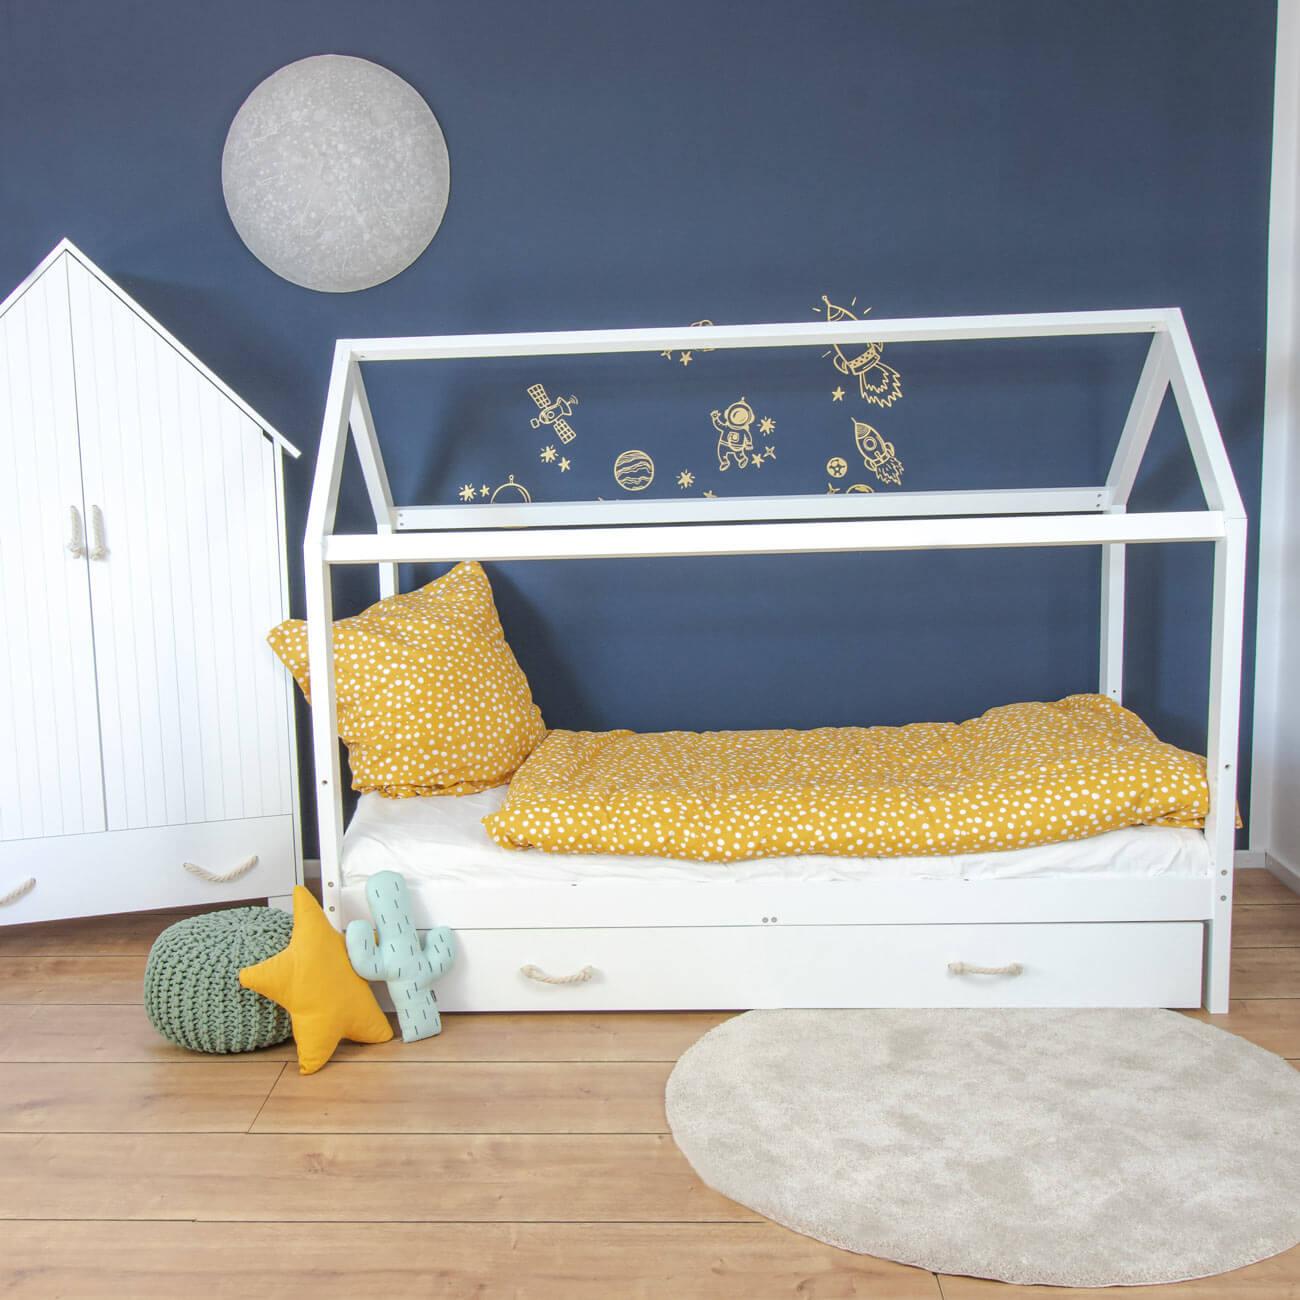 Hausbett Carlotta mit Unterbett - 90x200 cm, abnehmbarer Rausfallschutz in weiß